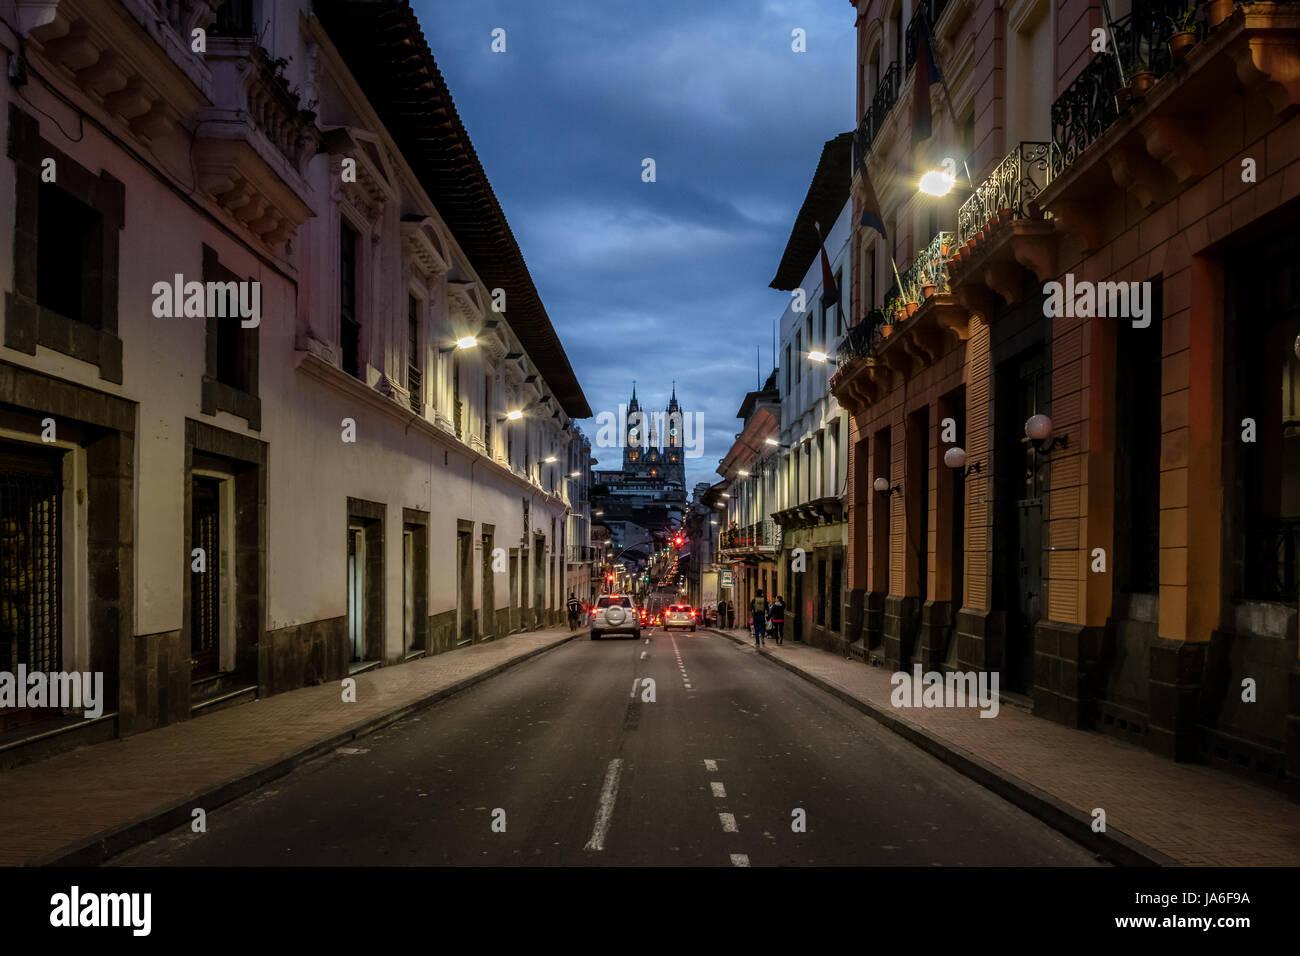 Rue de Quito et la Basilica del Voto Nacional de nuit - Quito, Équateur Photo Stock